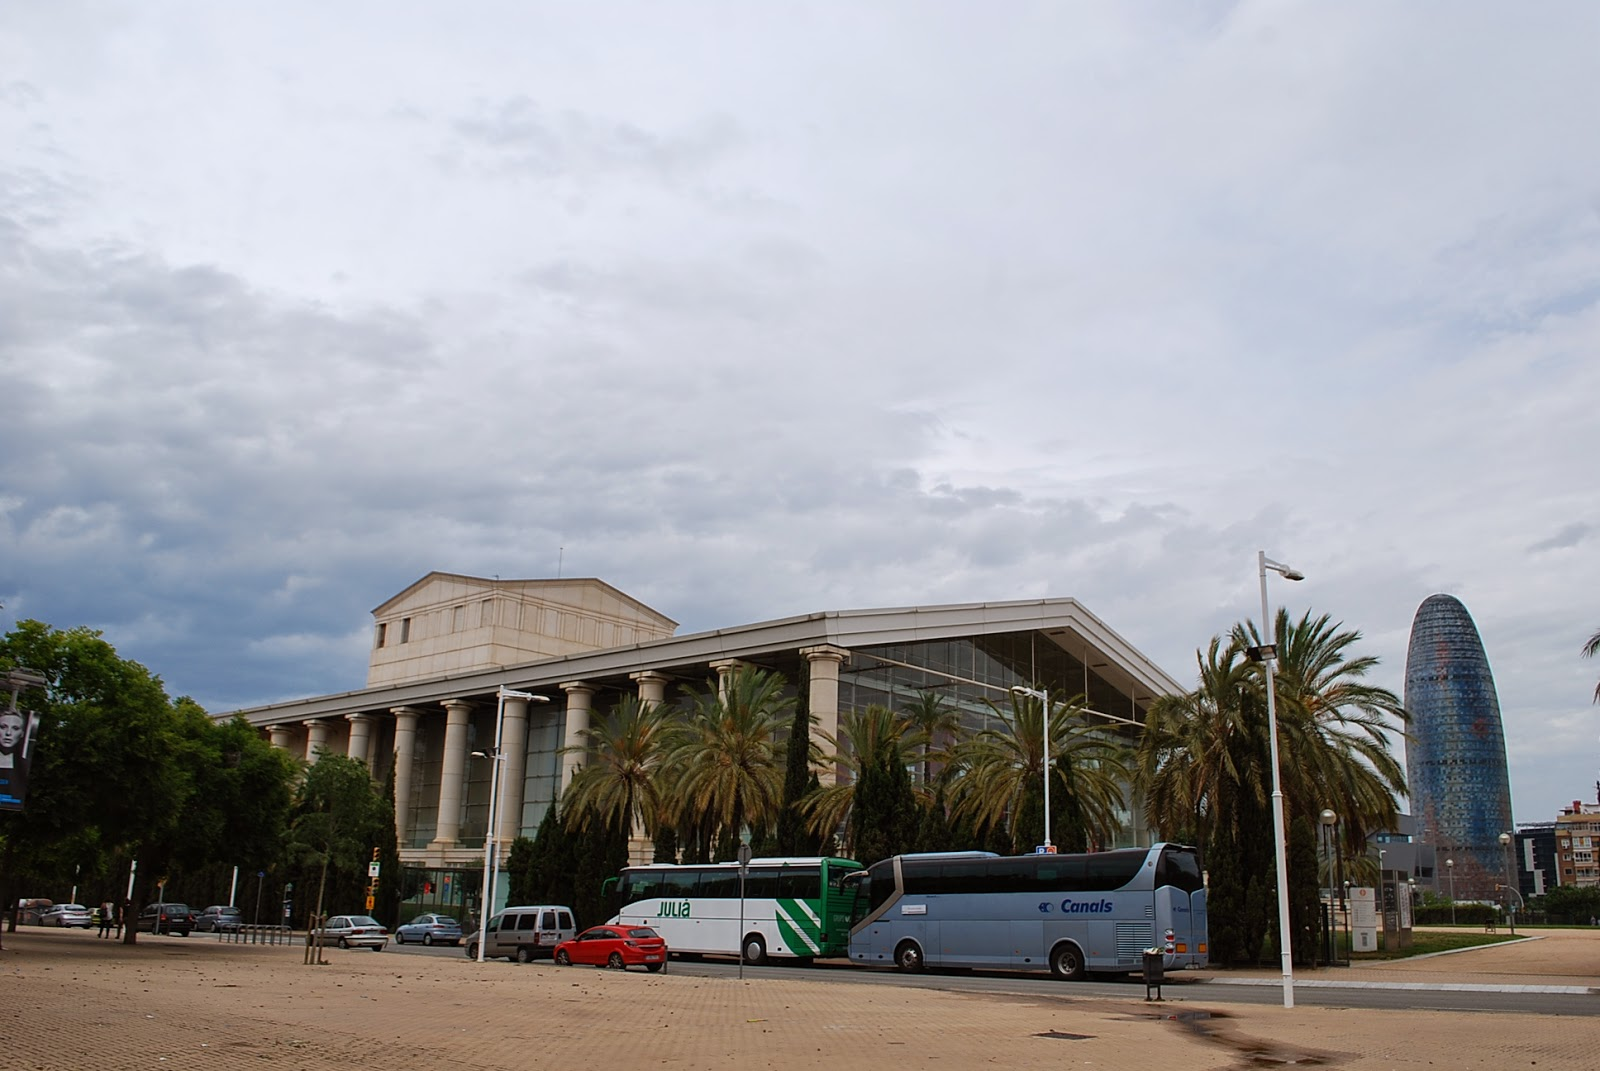 "Национальный театр Каталонии и башня ""Агбар"", Барселона, Испания. Teatre Nacional de Catalunya and ""Agbar"" tower( Torre Agbar), Barcelona, Catalonia, Spain"